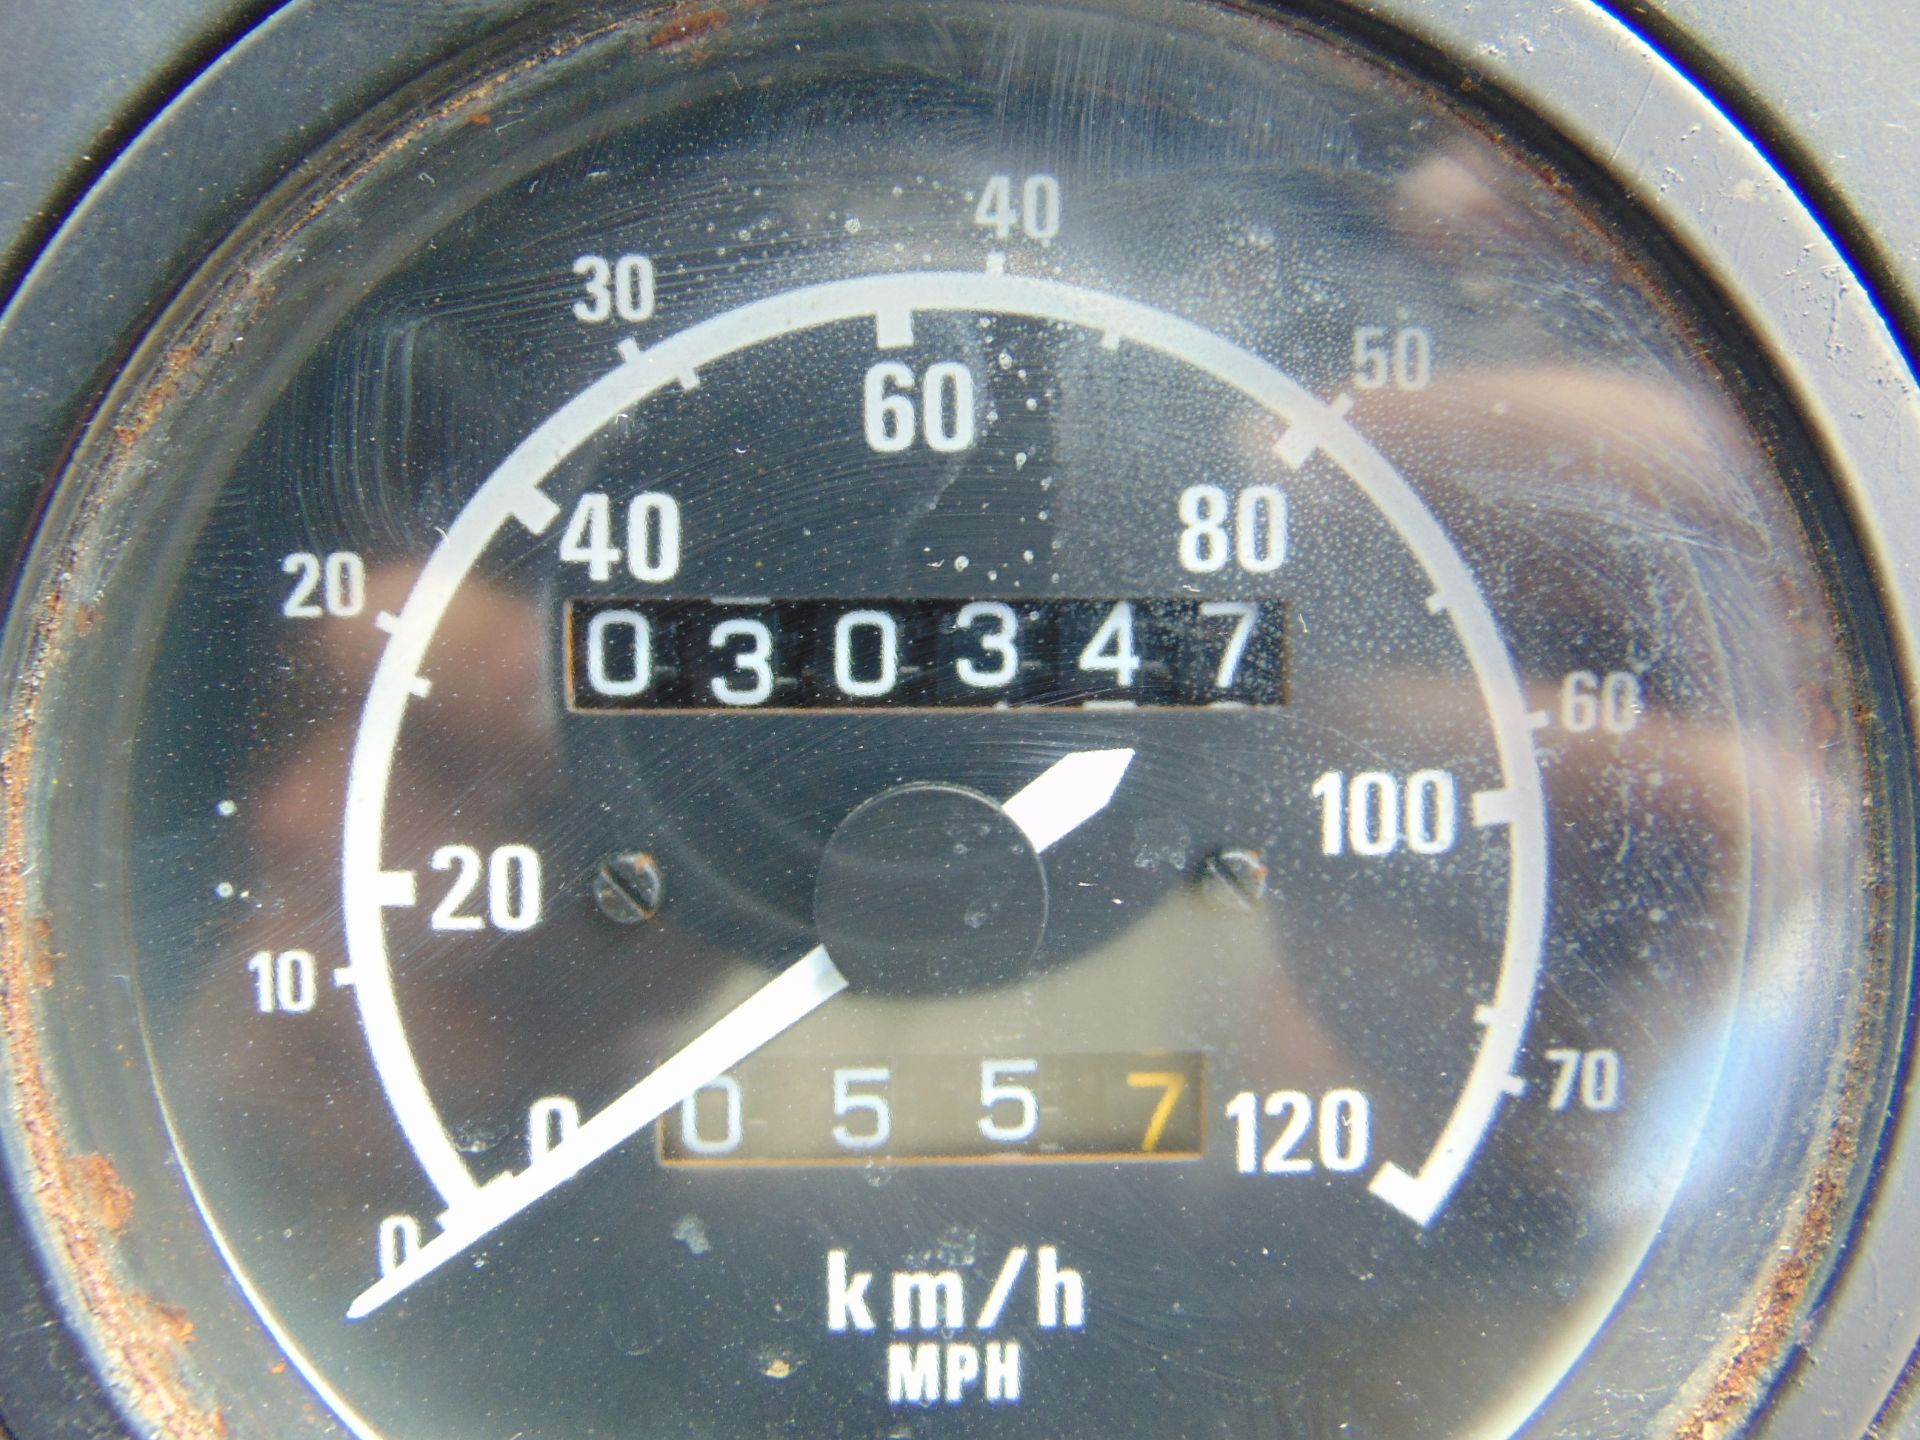 Leyland Daf 45/150 4 x 4 - Image 22 of 22